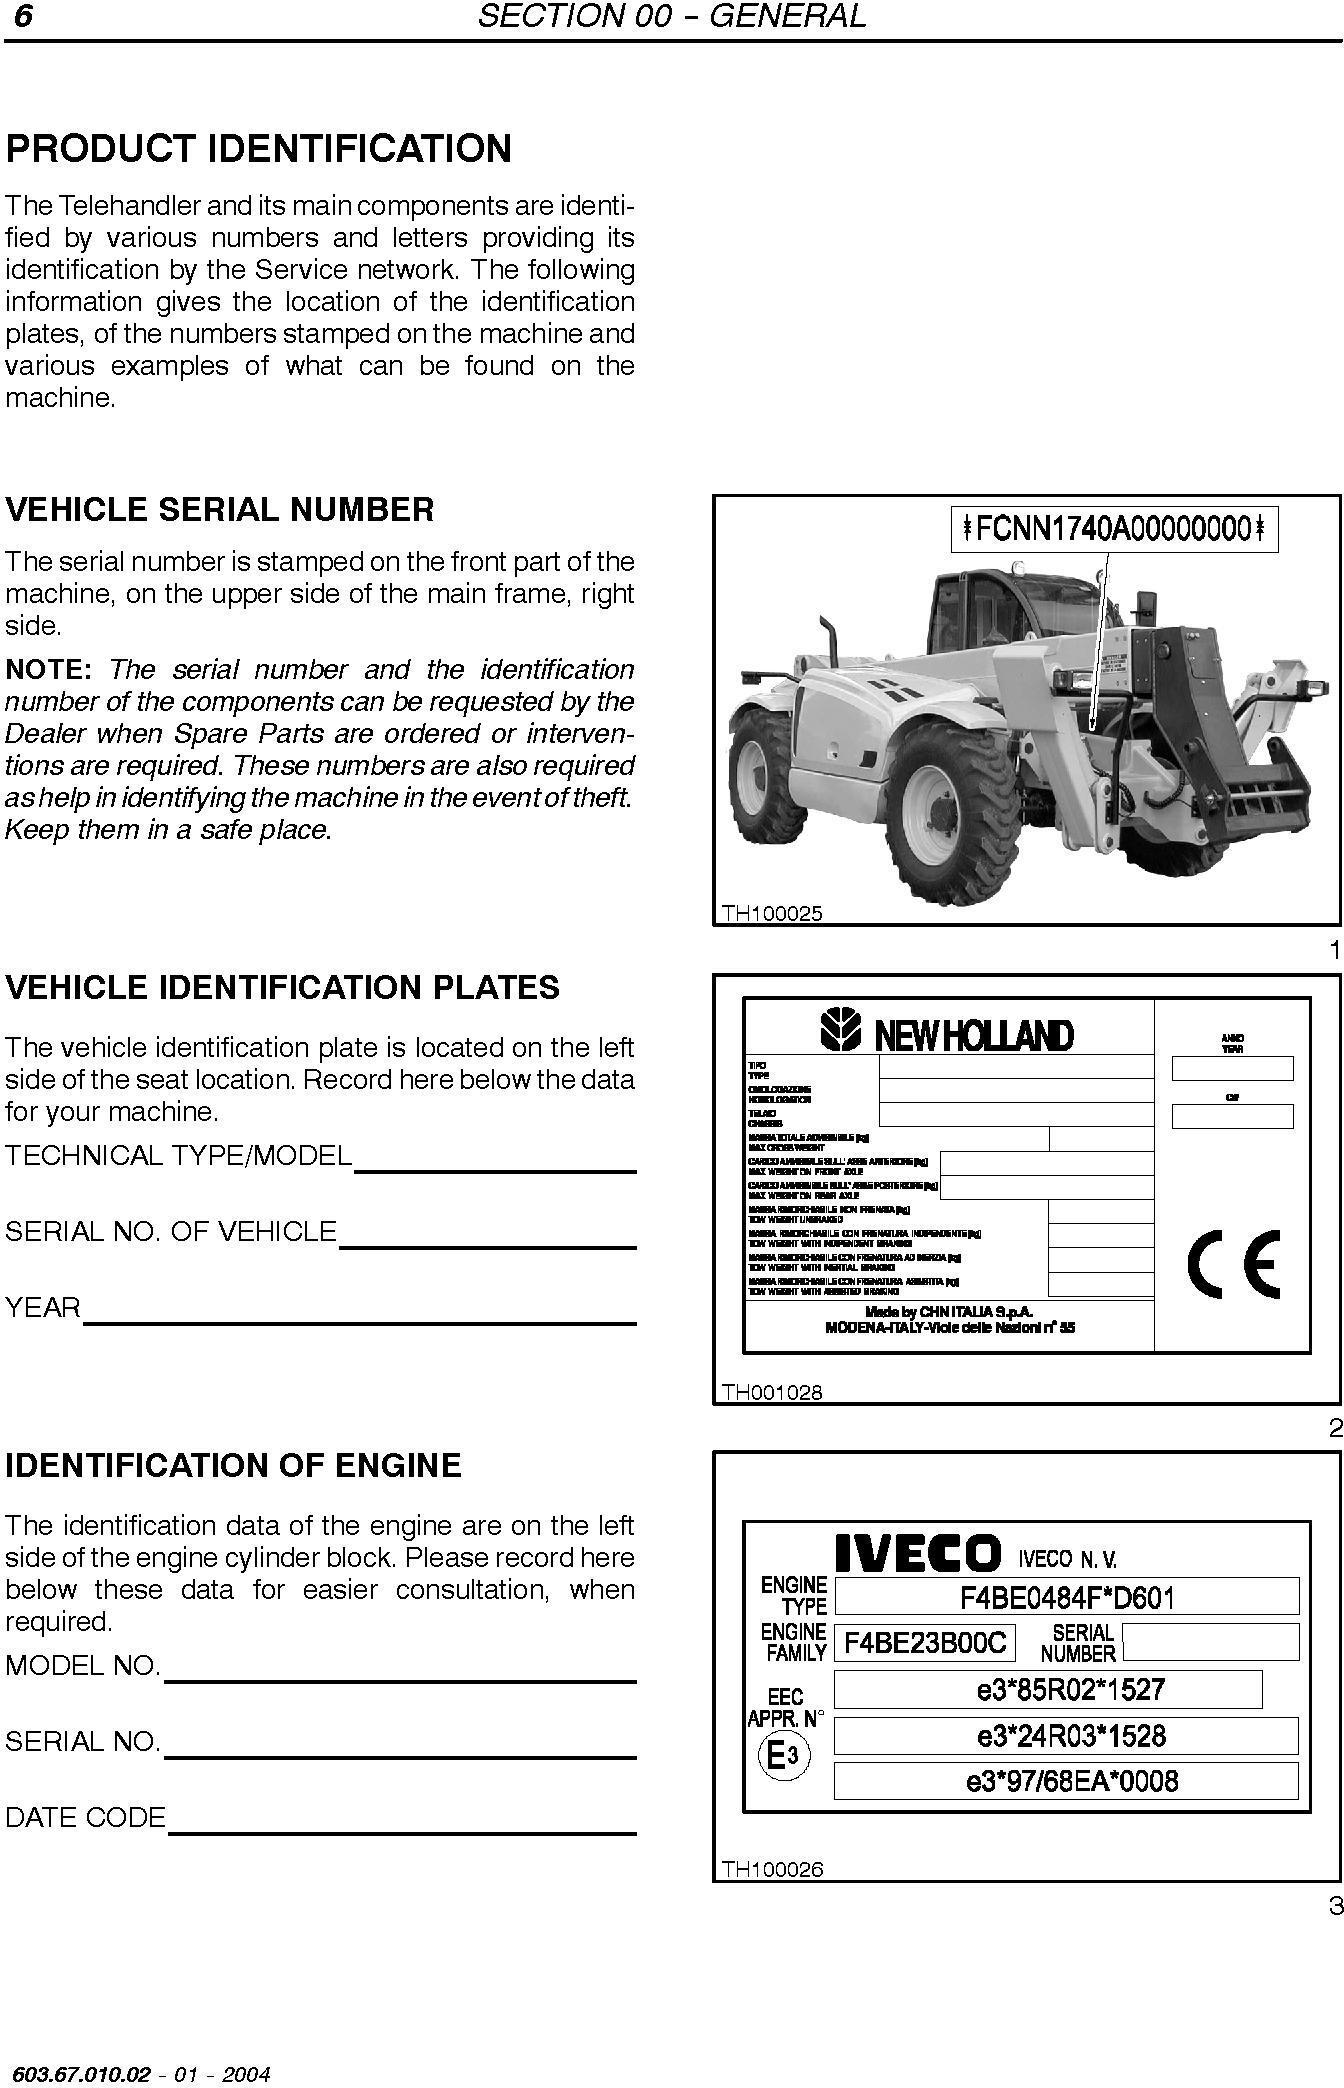 New Holland LM1340, LM1440, LM1740 Telehandler Service Manual - 1